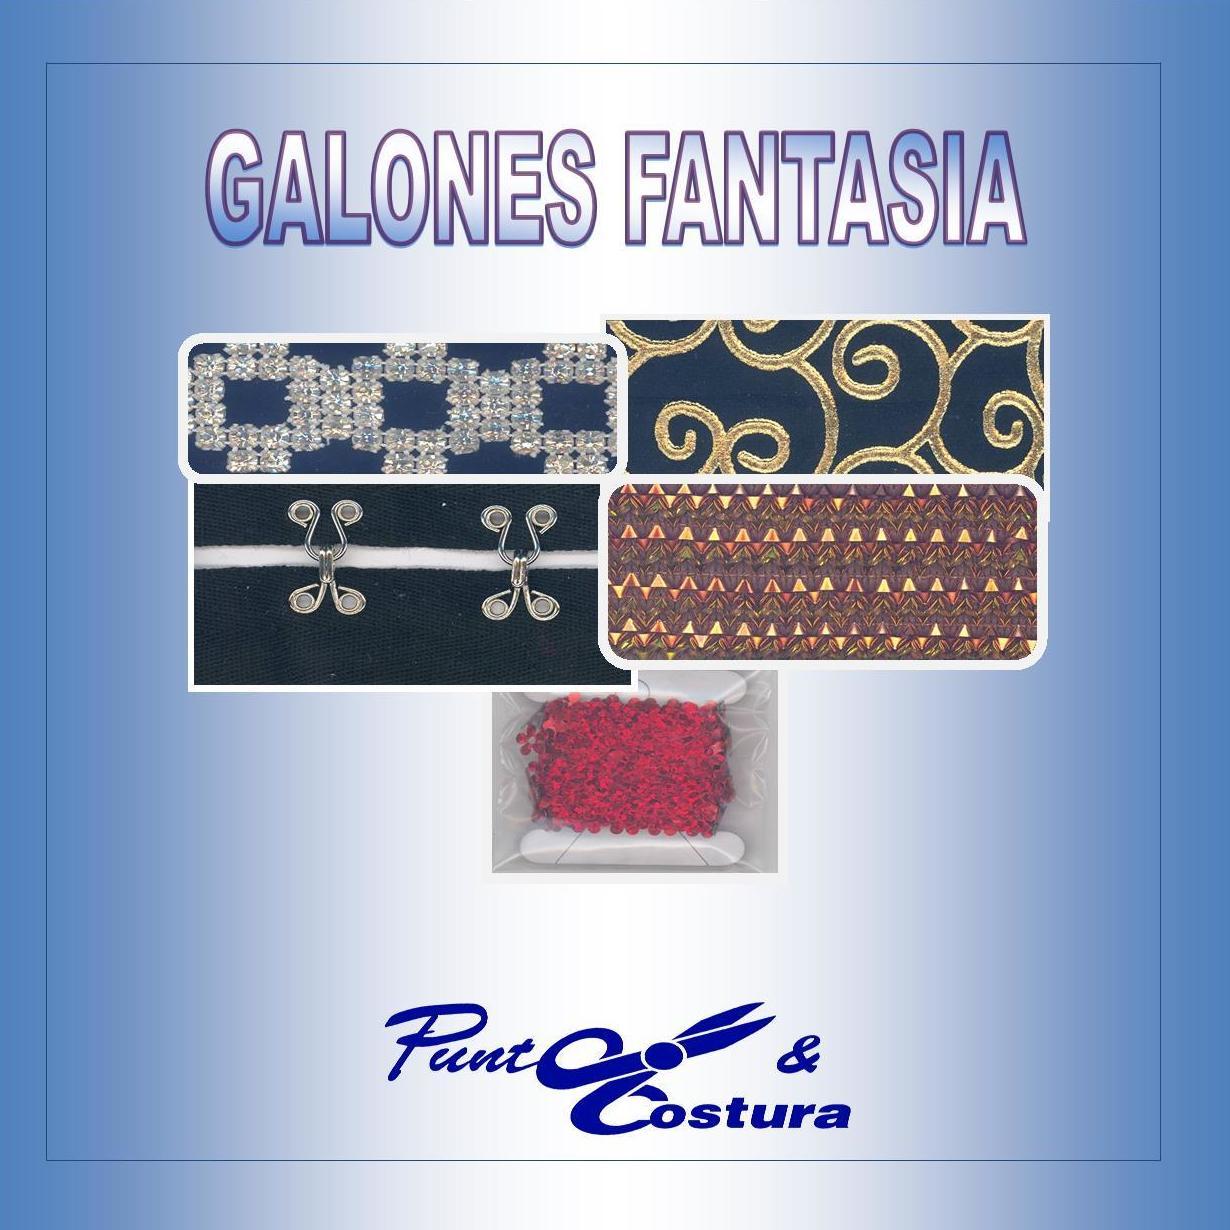 Galones Fantasia: Catálogo de MANUEL RODRÍGUEZ MARTÍNEZ